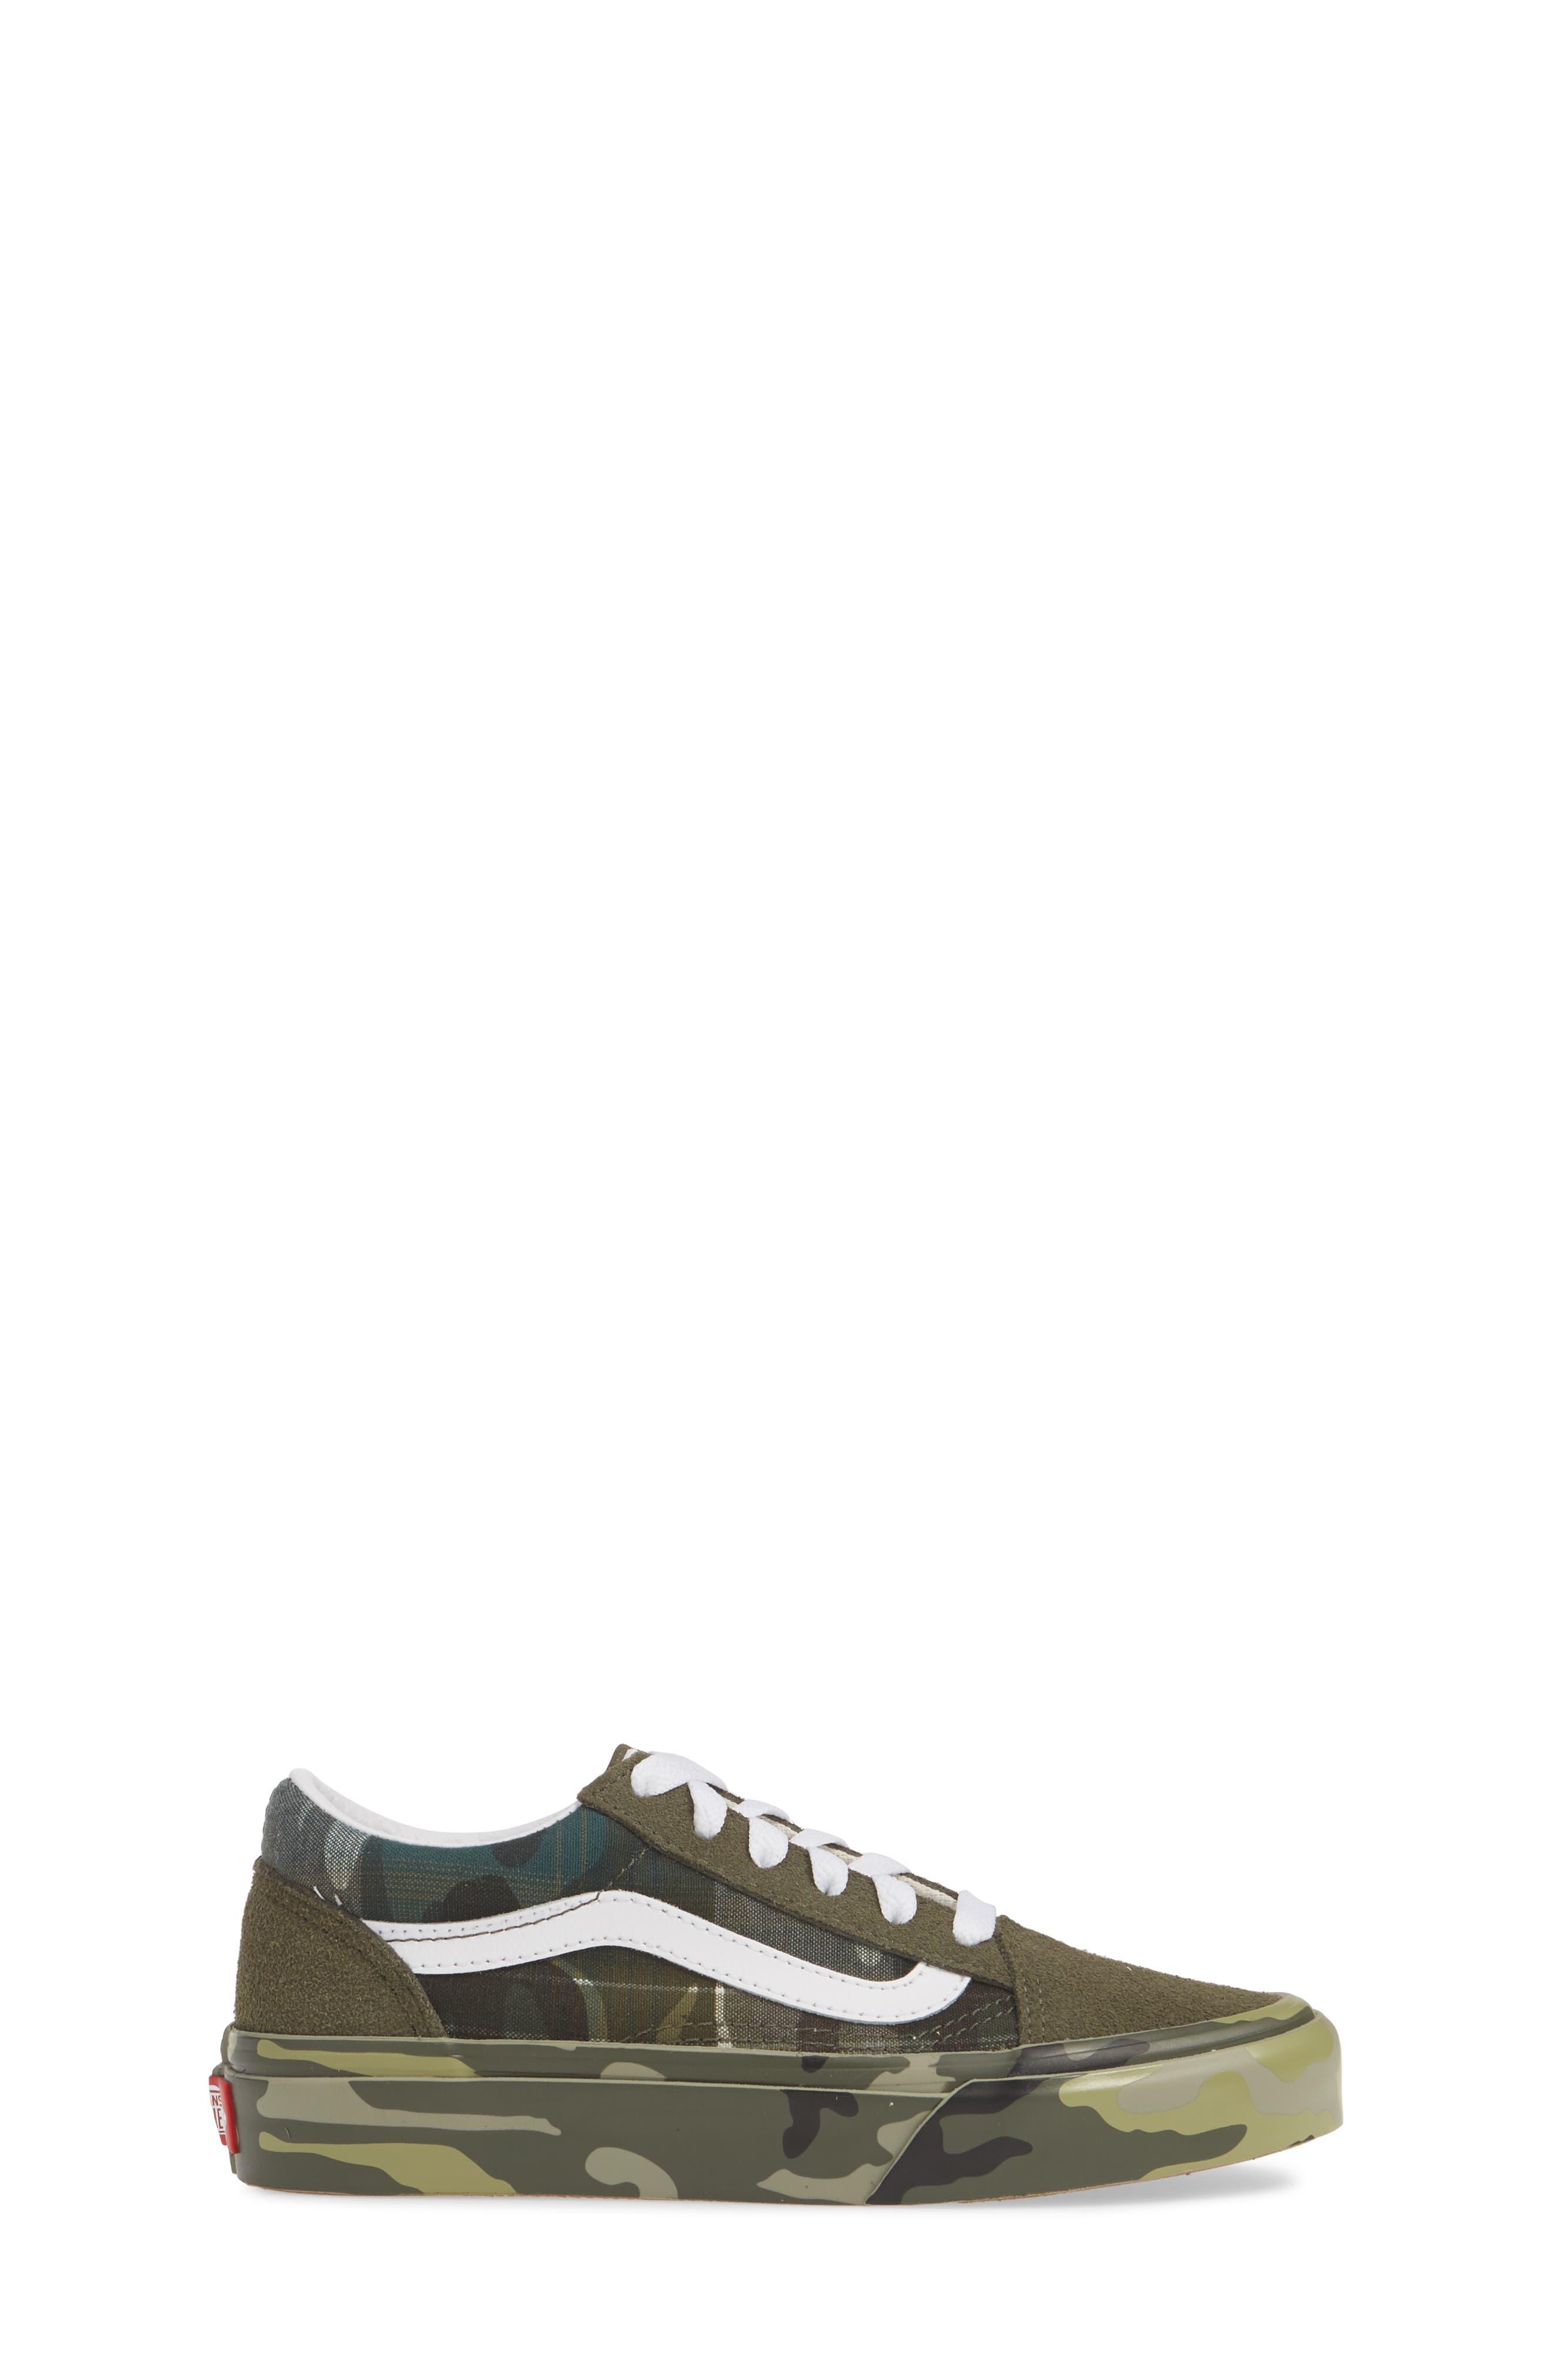 VANS, Old Skool Sneaker, Alternate thumbnail 3, color, PLAID CAMO GRAPE LEAF/ WHITE